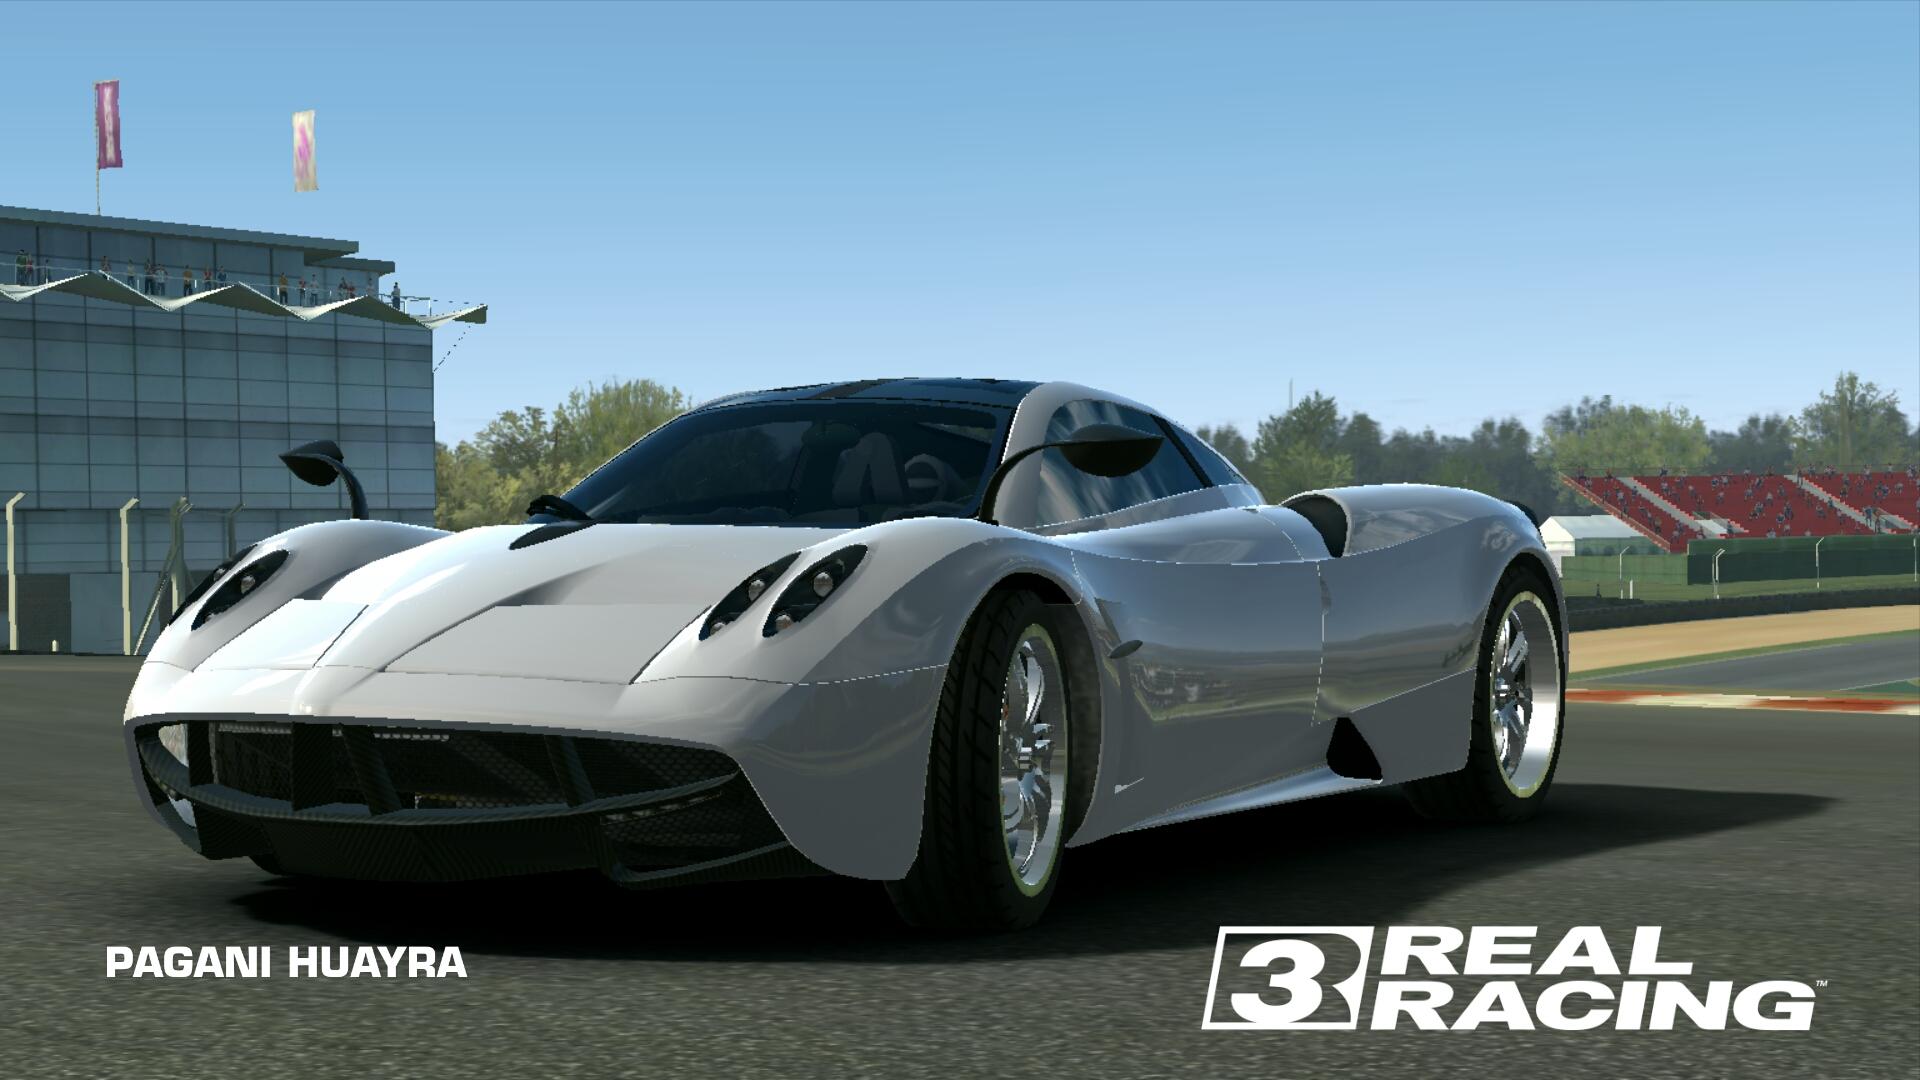 PAGANI HUAYRA | Real Racing 3 Wiki | FANDOM powered by Wikia